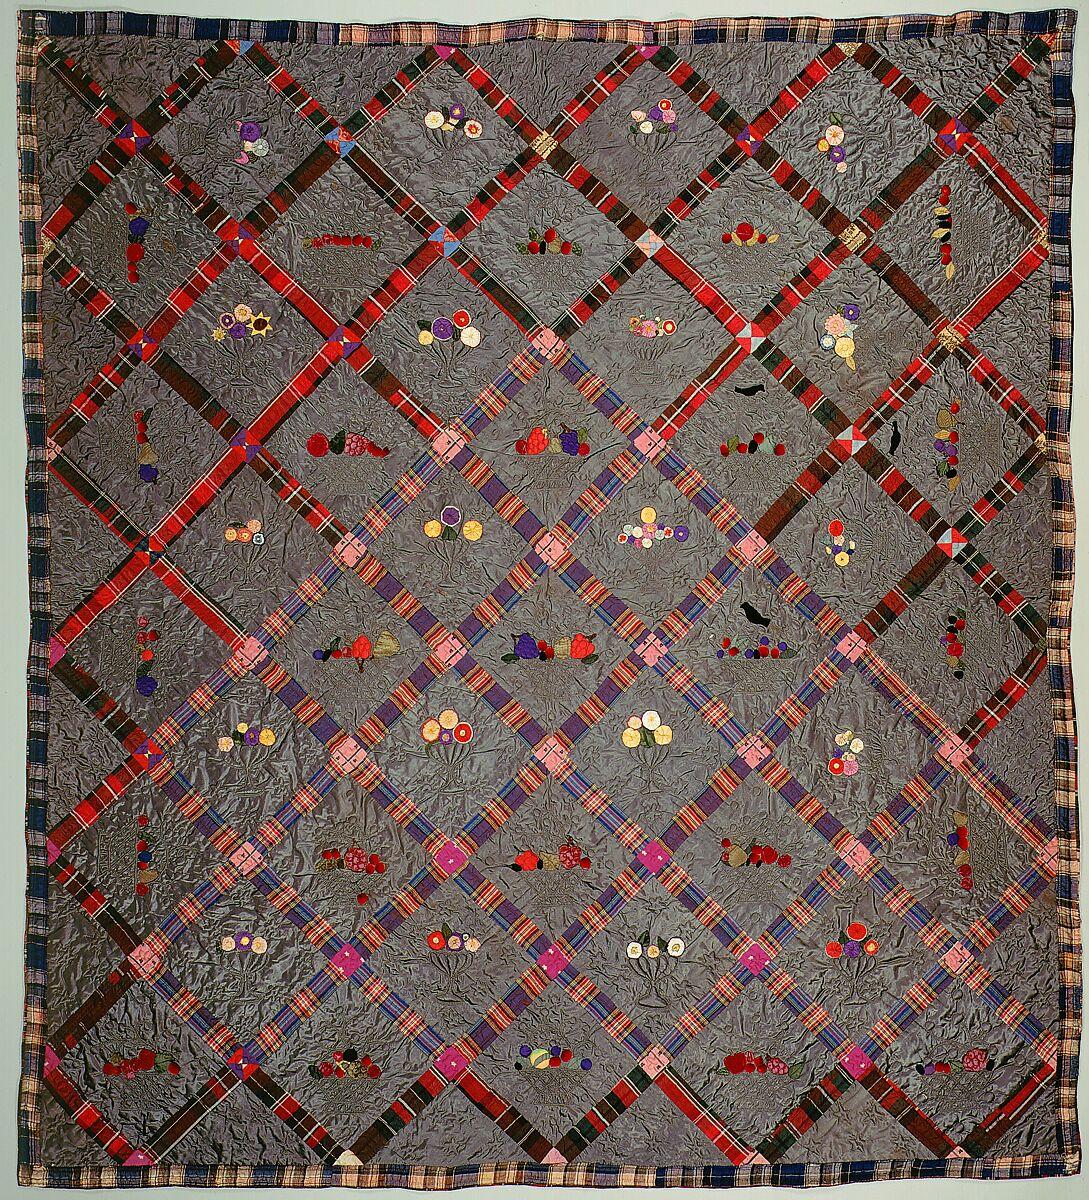 Quilt, Fruit Baskets pattern | American | The Met